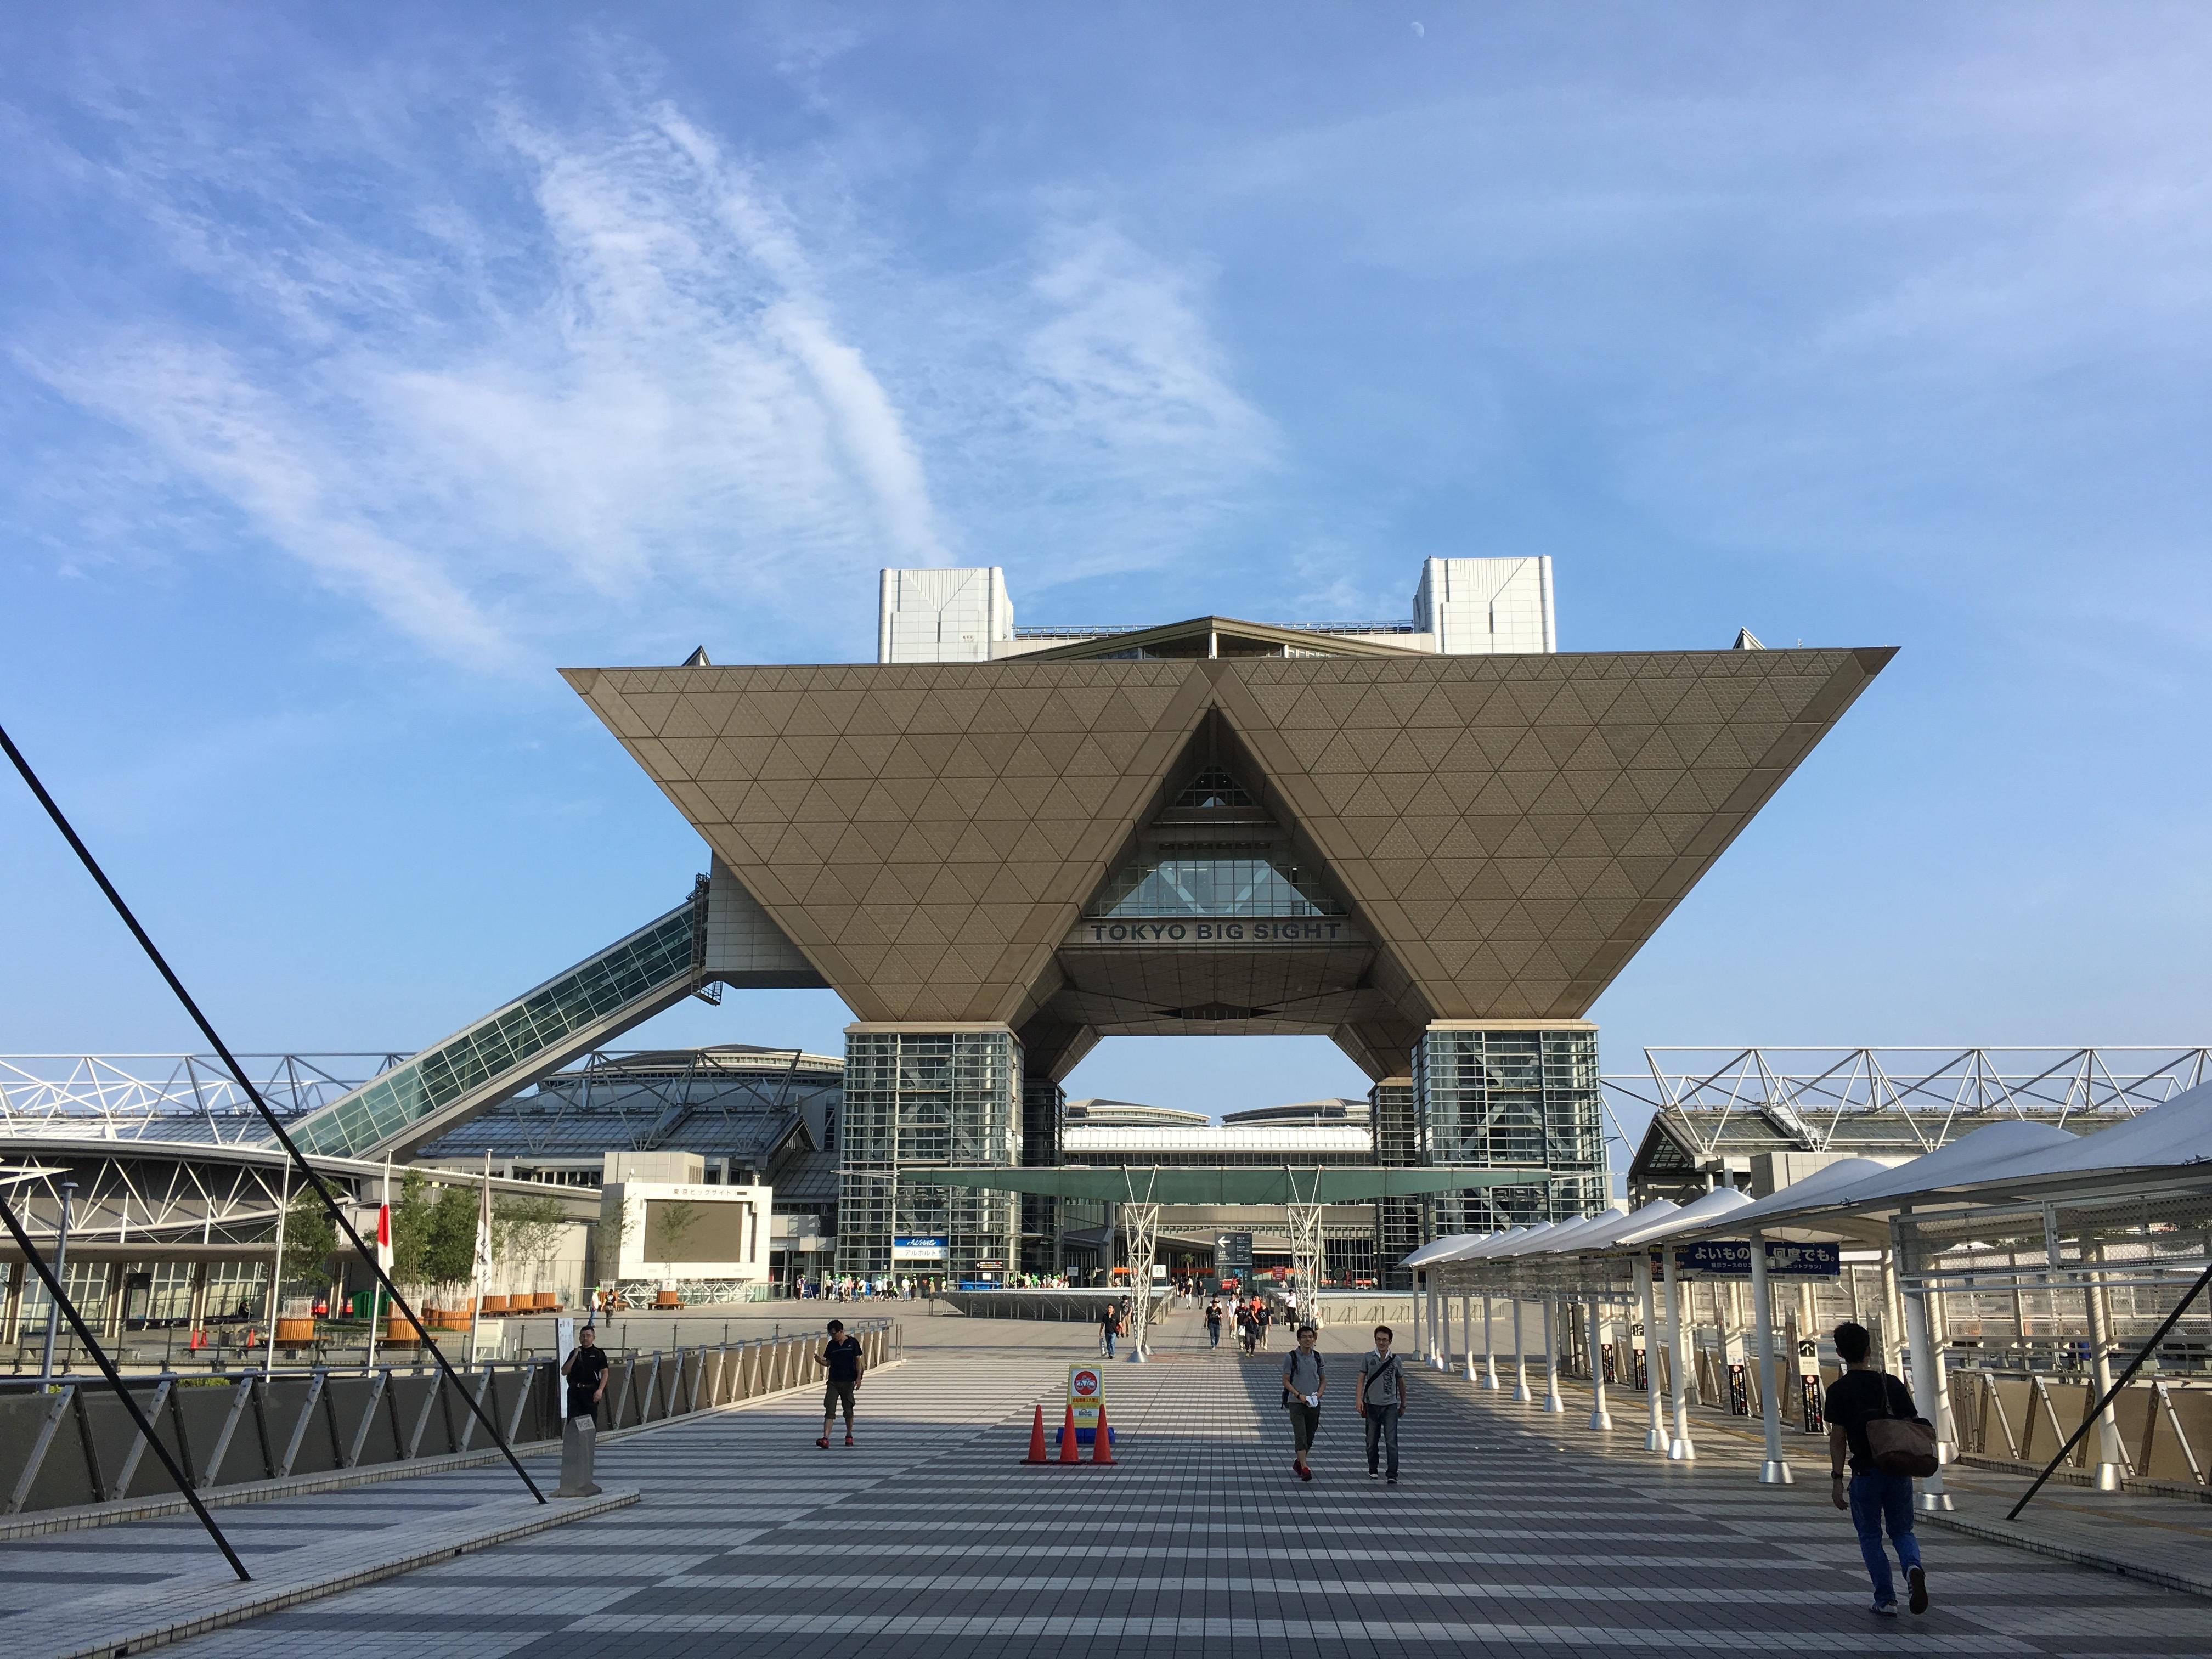 Tokyo Big Sight 2016 Comiket